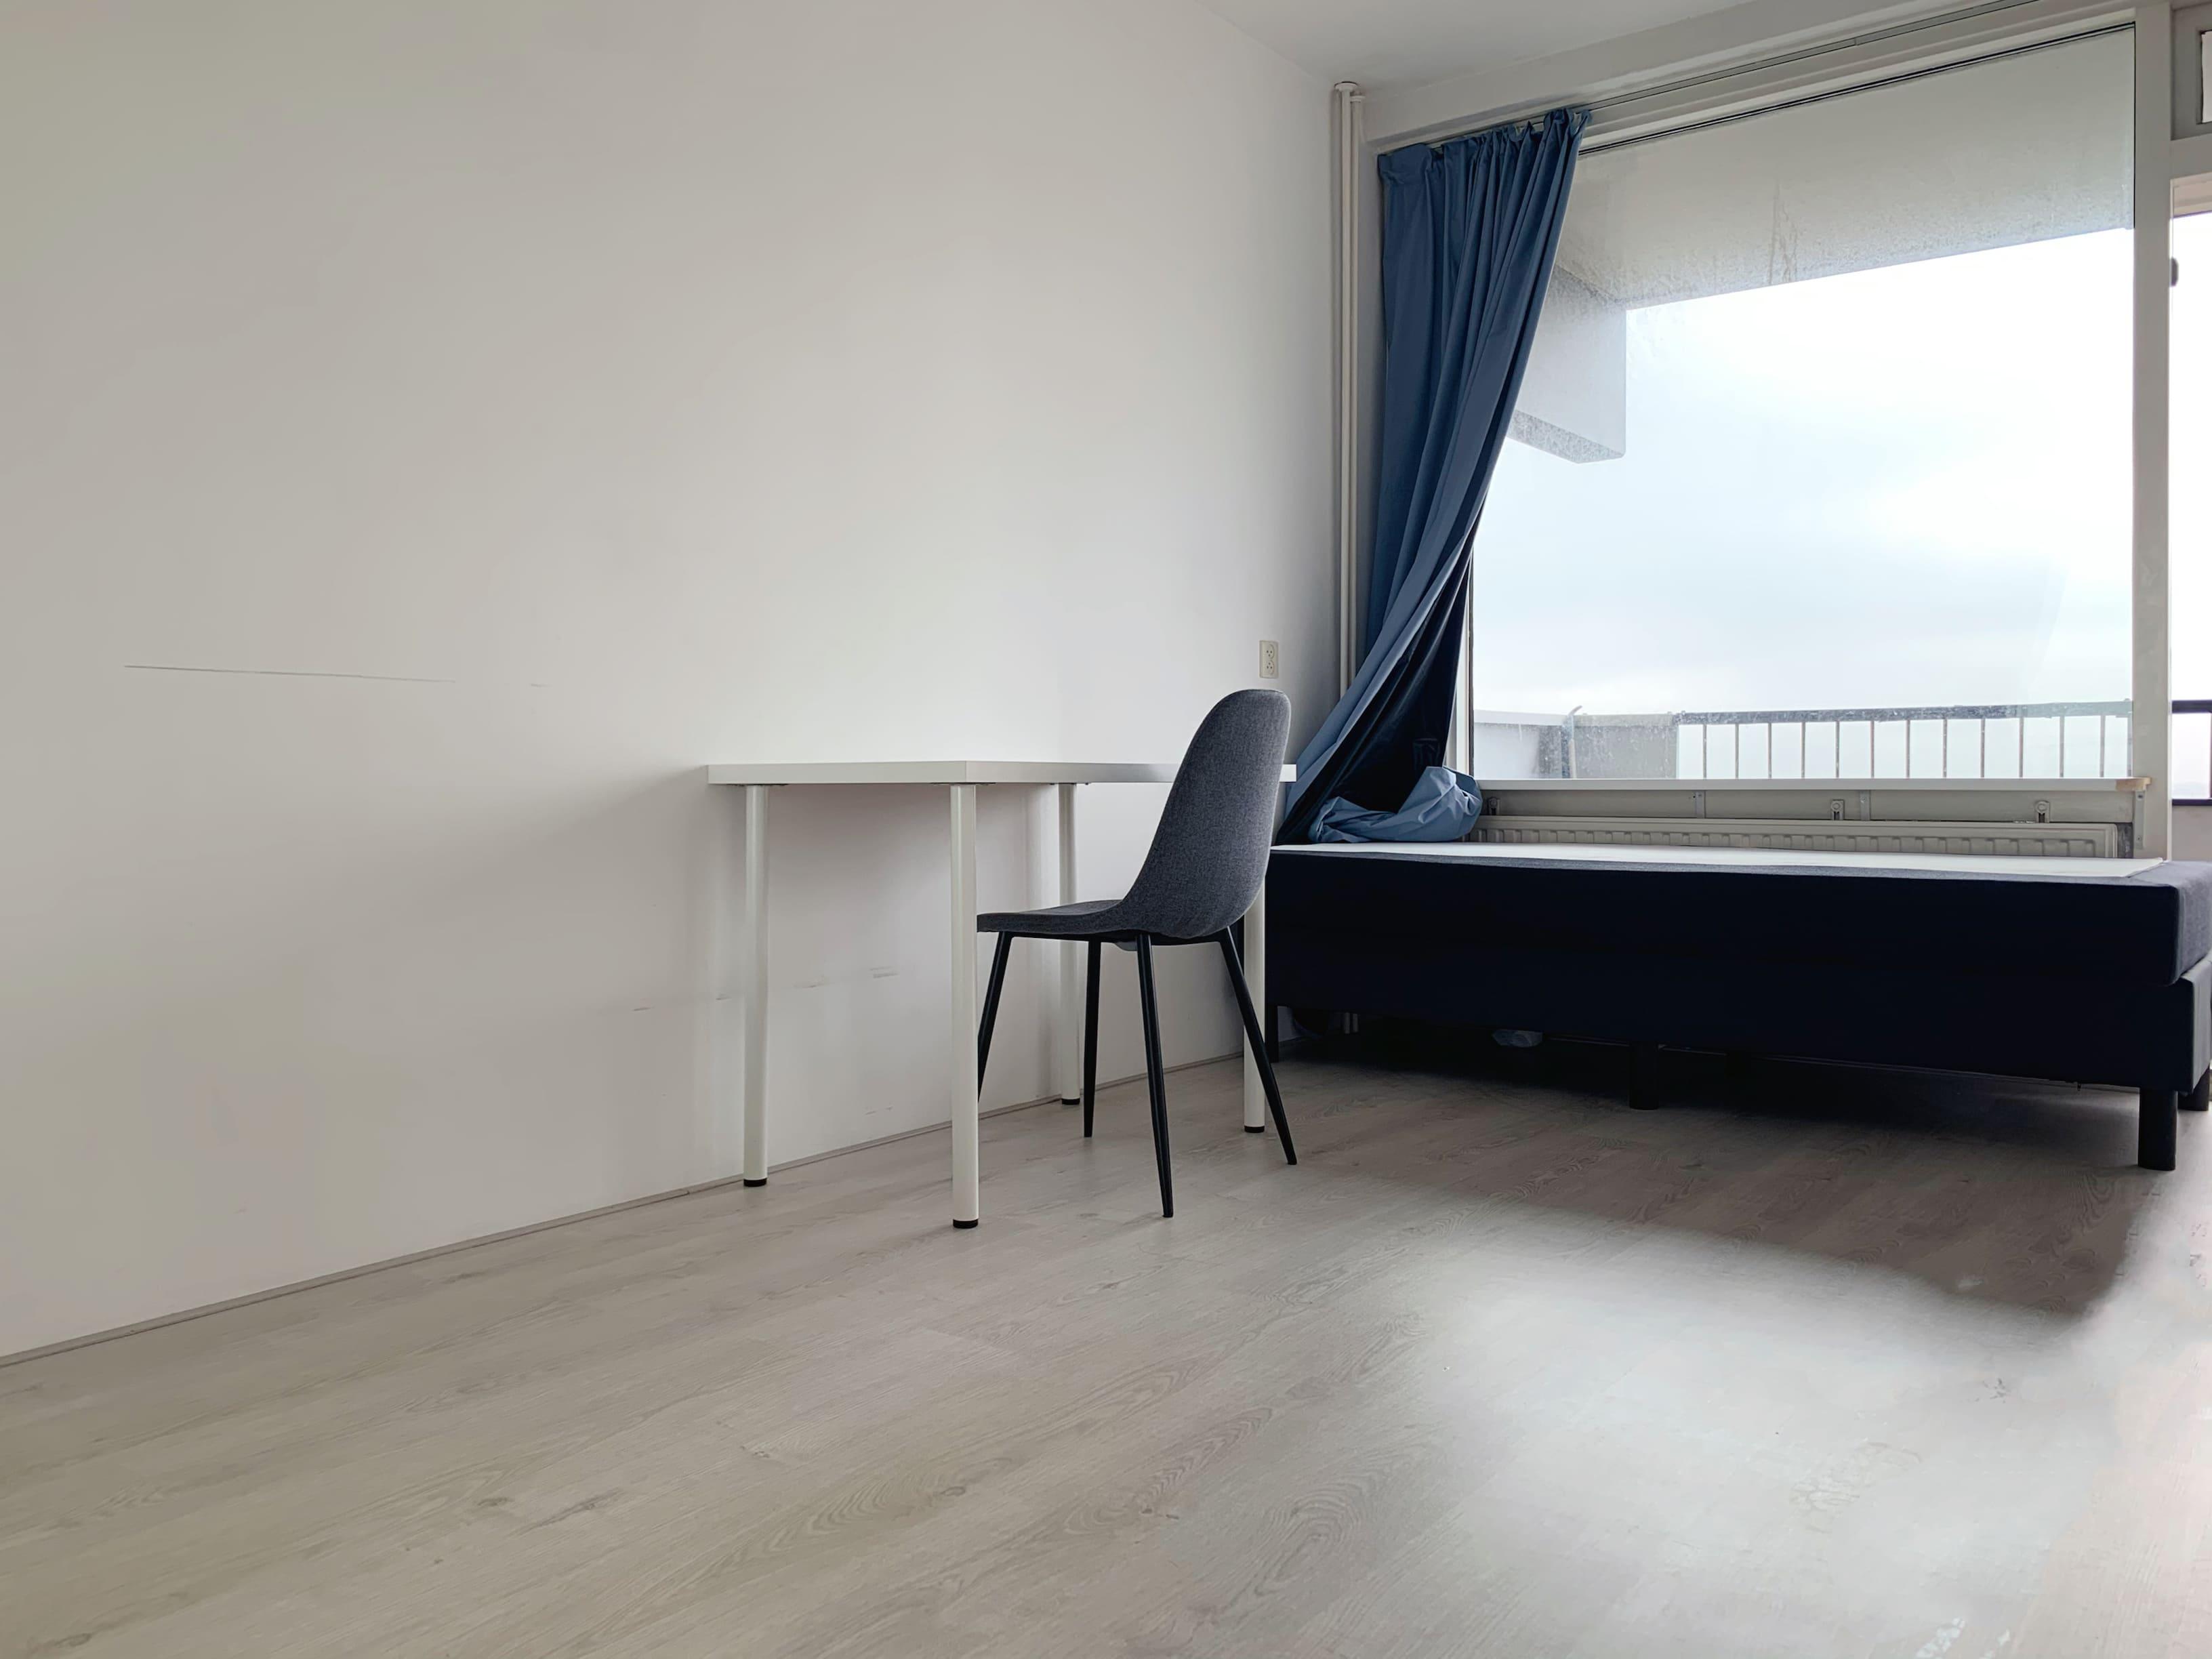 Amstelveen 1186GM 高层公寓出租单间现出租